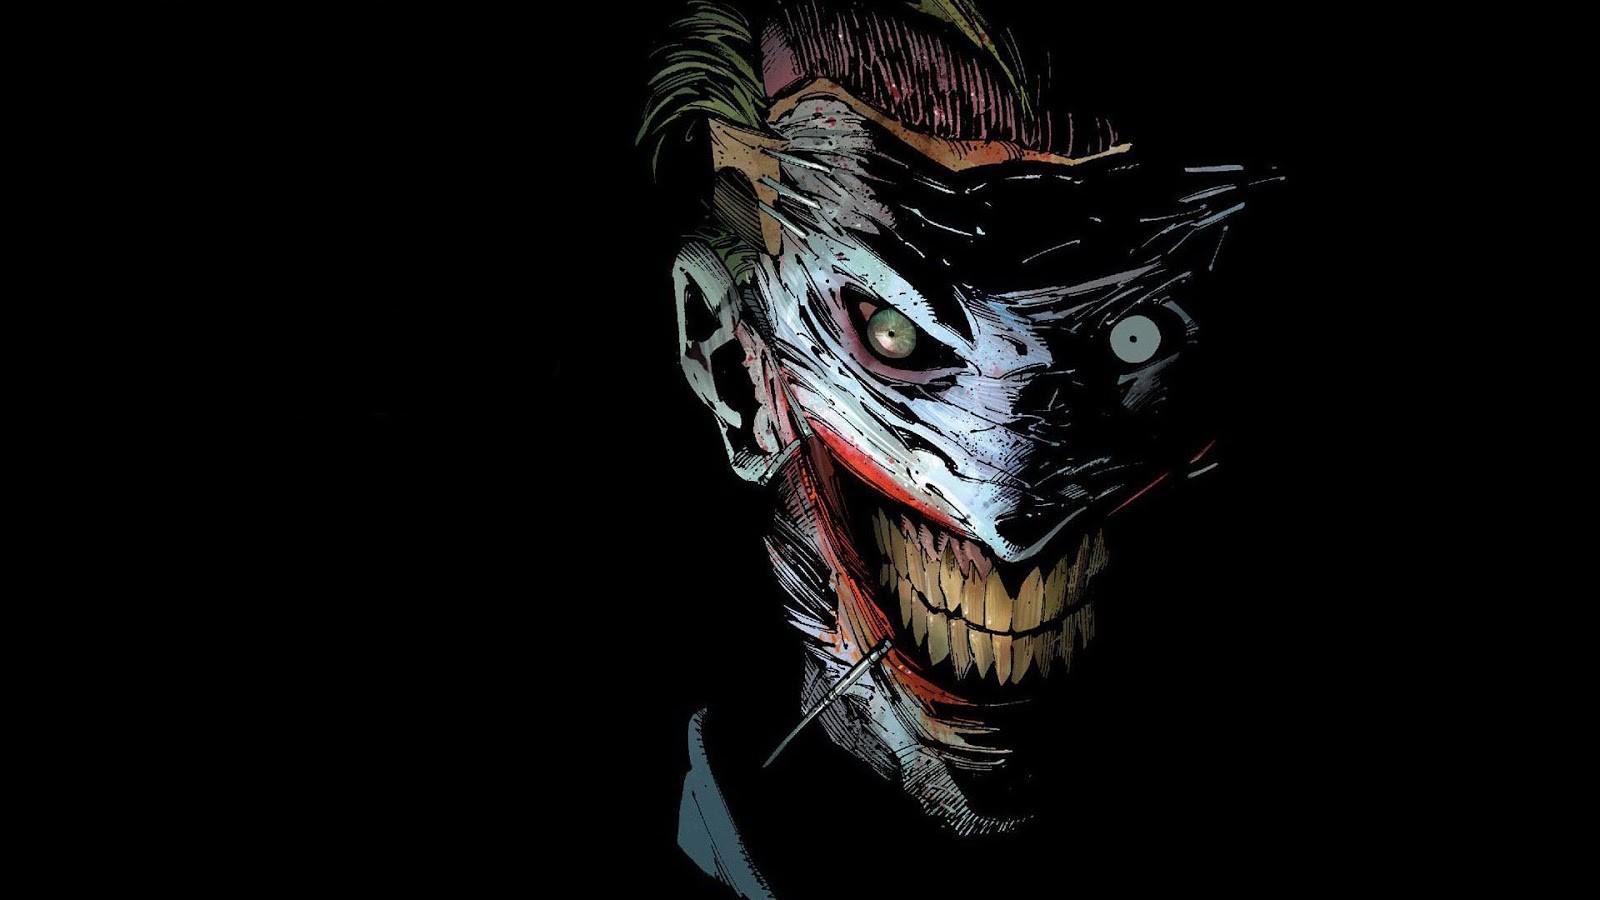 Joker 4k wallpapers